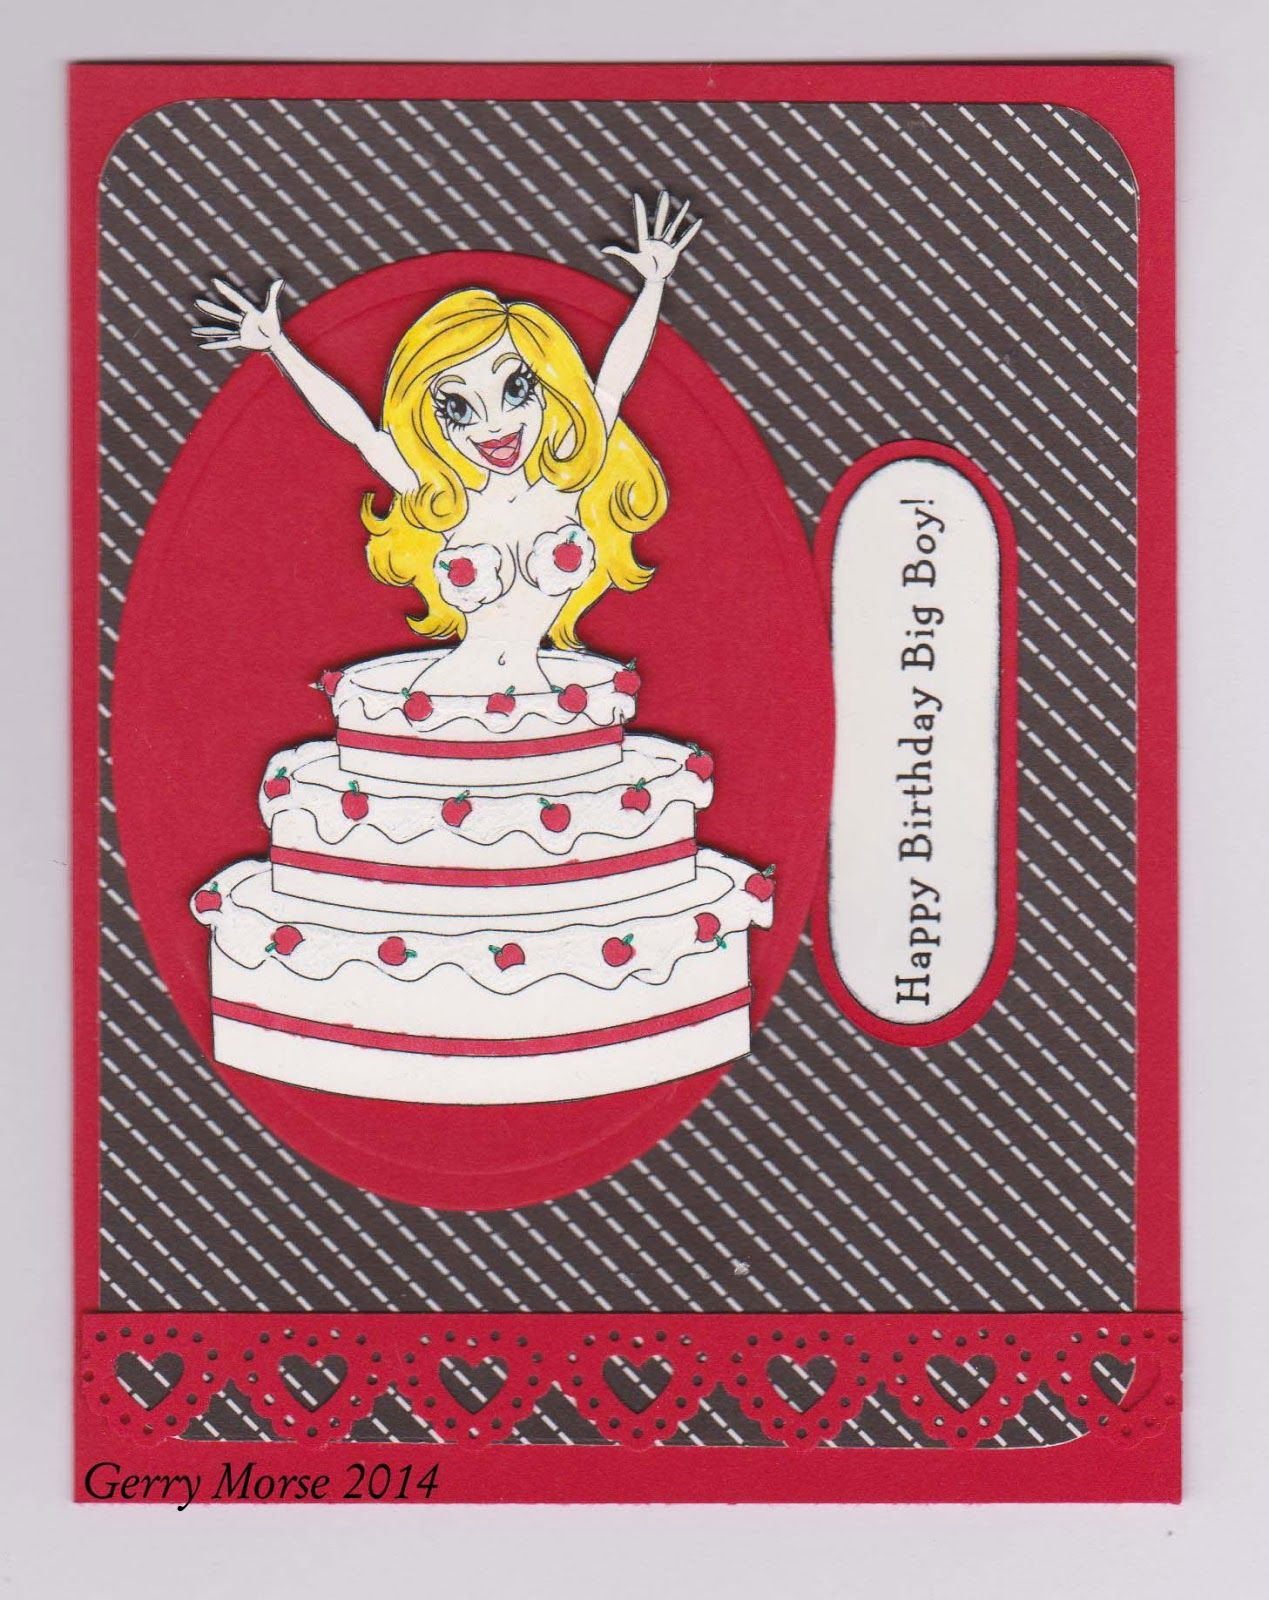 Corner Vegas Happy Birthday Big Boy Vegas Happy Birthday Big Boy My Cards Pinterest Big Boys Happy Birthday Big Boy Pepperoni Happy Birthday Big Boy German